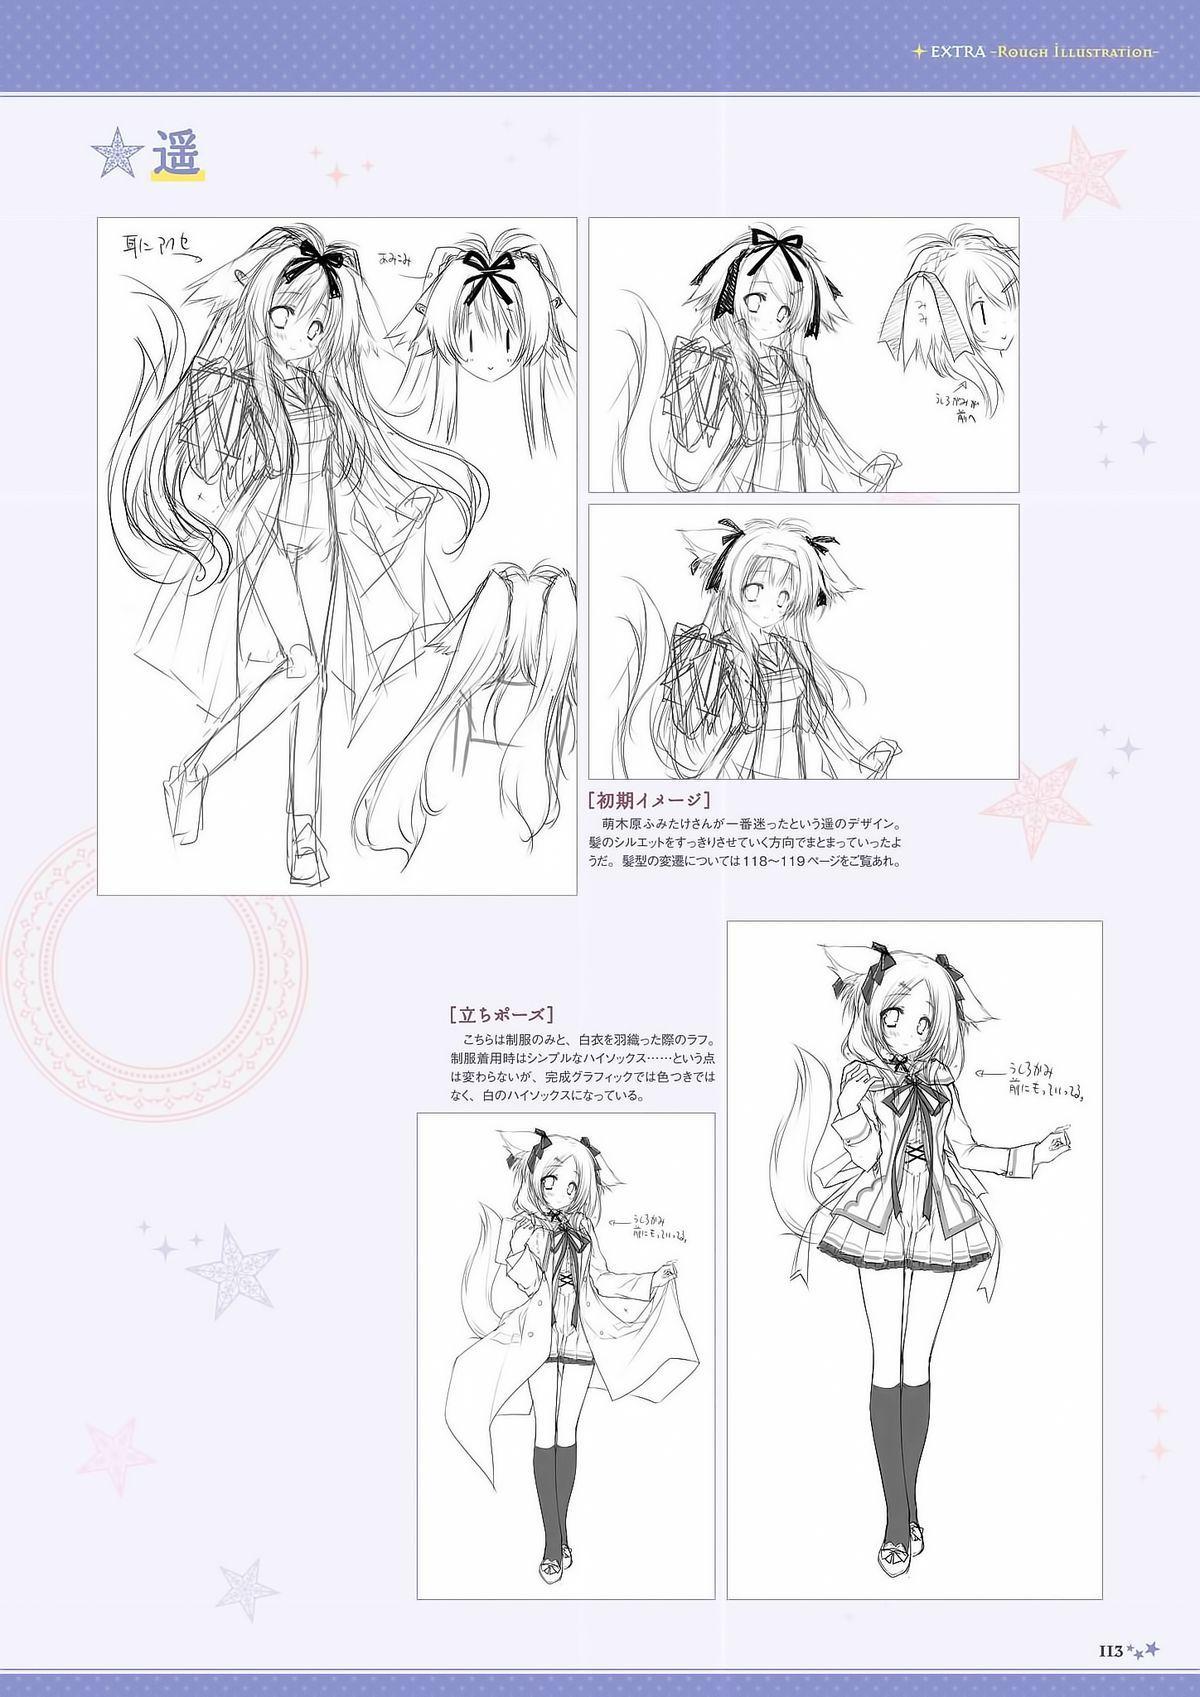 Sekai to Sekai no Mannaka de Visual Fanbook 110